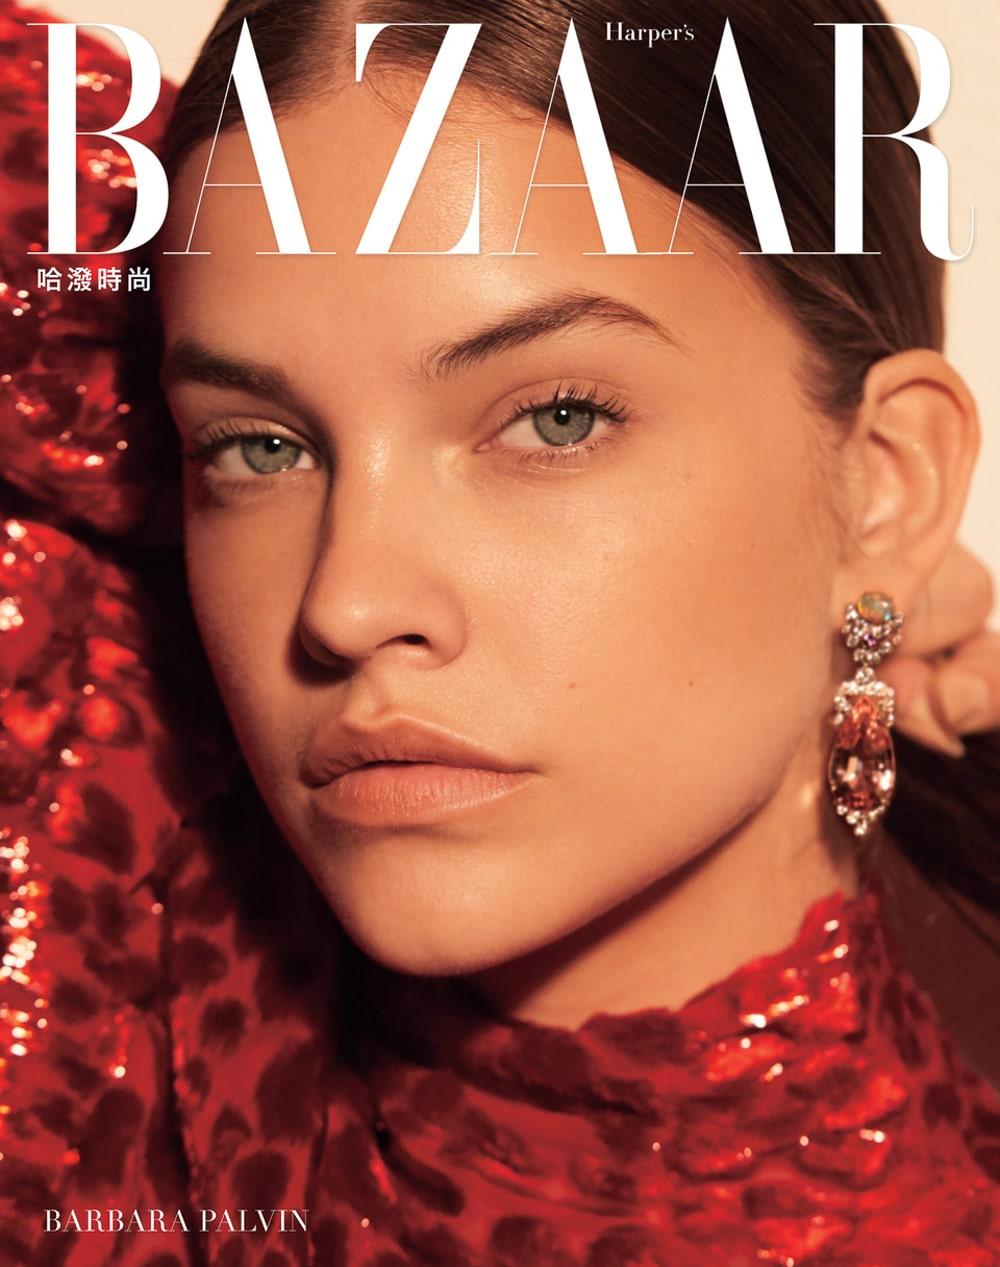 Barbara-Palvin-for-Harpers-Bazaar-Taiwan-August-2018-by-David-Roemer-2.jpg